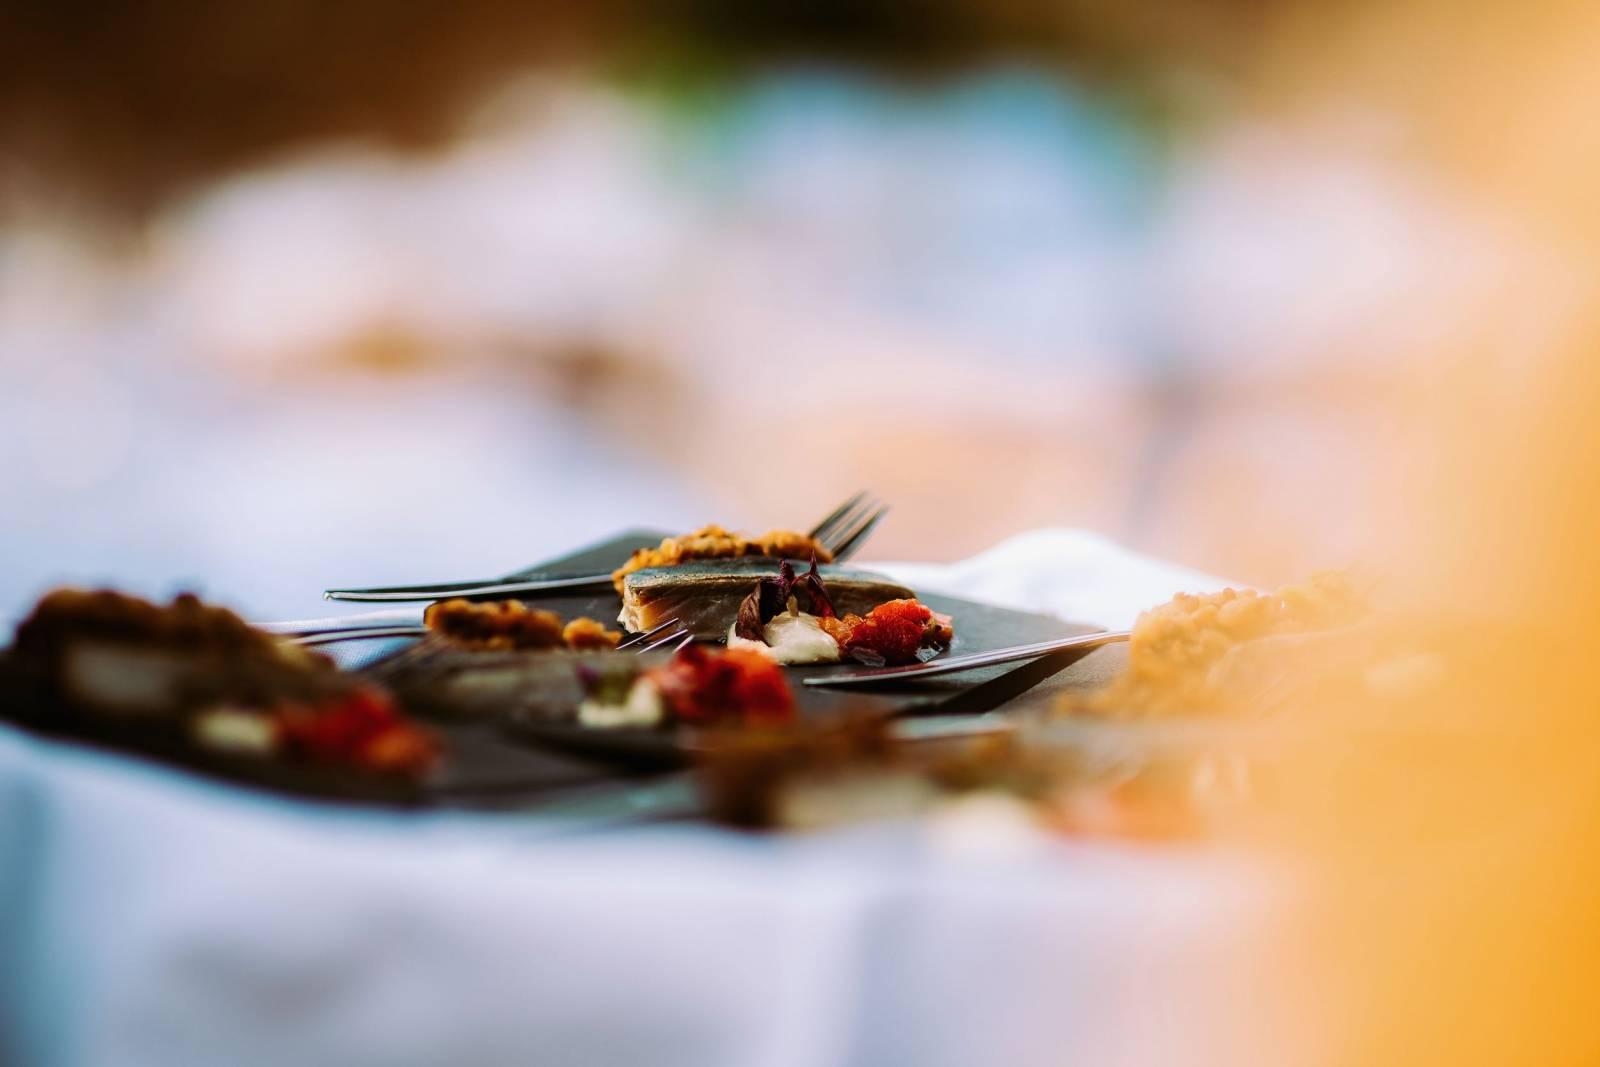 Insieme - Catering - Cateraar - Traiteur - House of Events - House of Weddings - 6